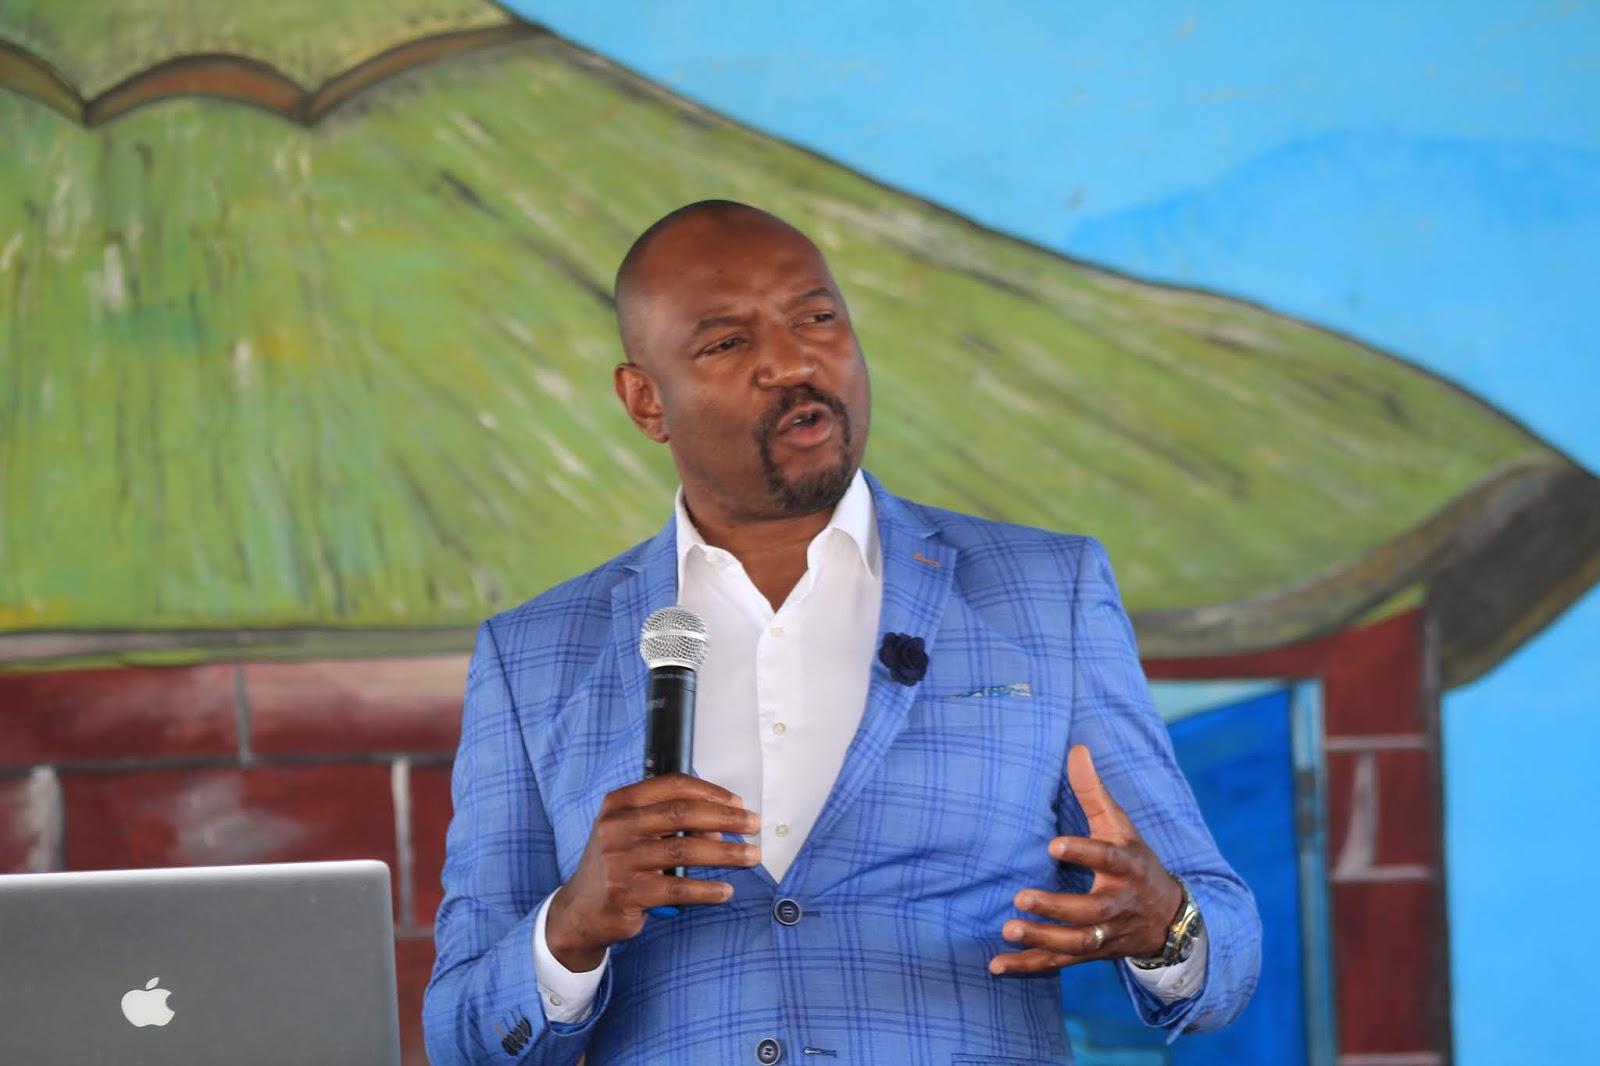 Pastor Sacrifice Chirisa Teaches On Business At Tiyambuke 2018